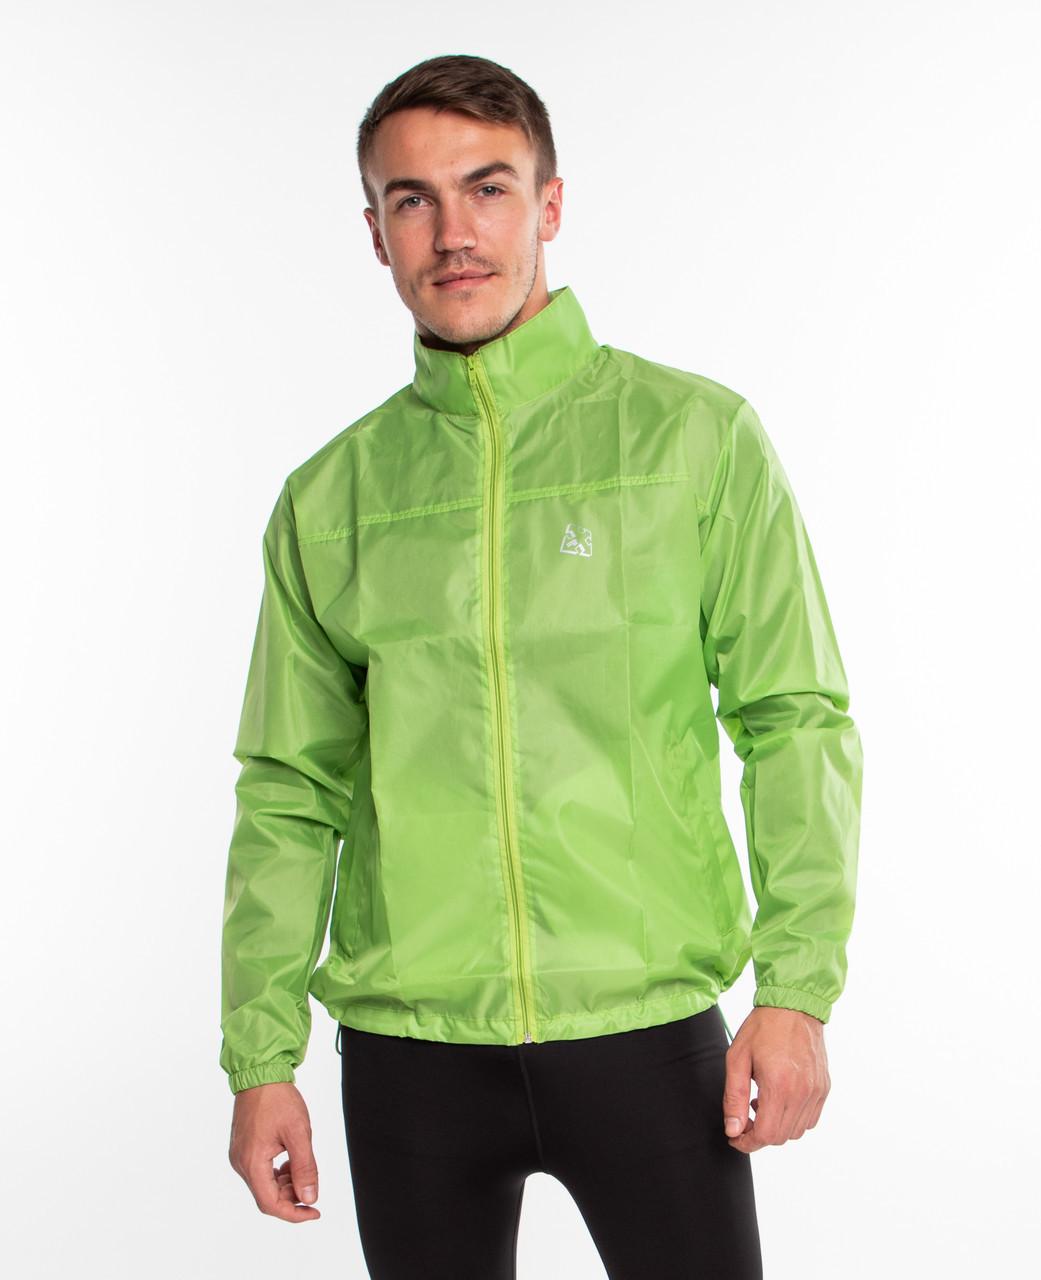 Куртка-дощовик чоловіча Radical Flurry, з капюшоном, легка водонепроникна куртка